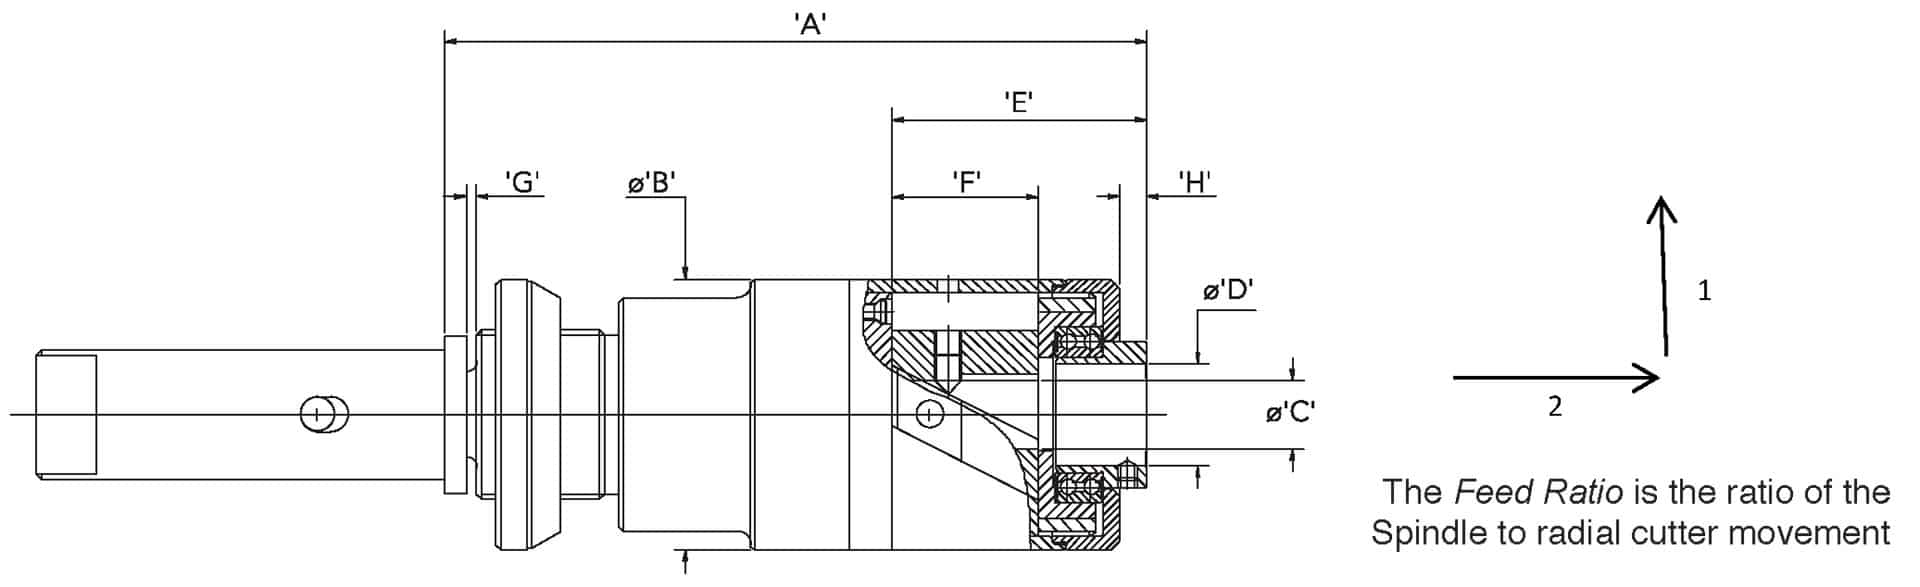 AR16 diagram